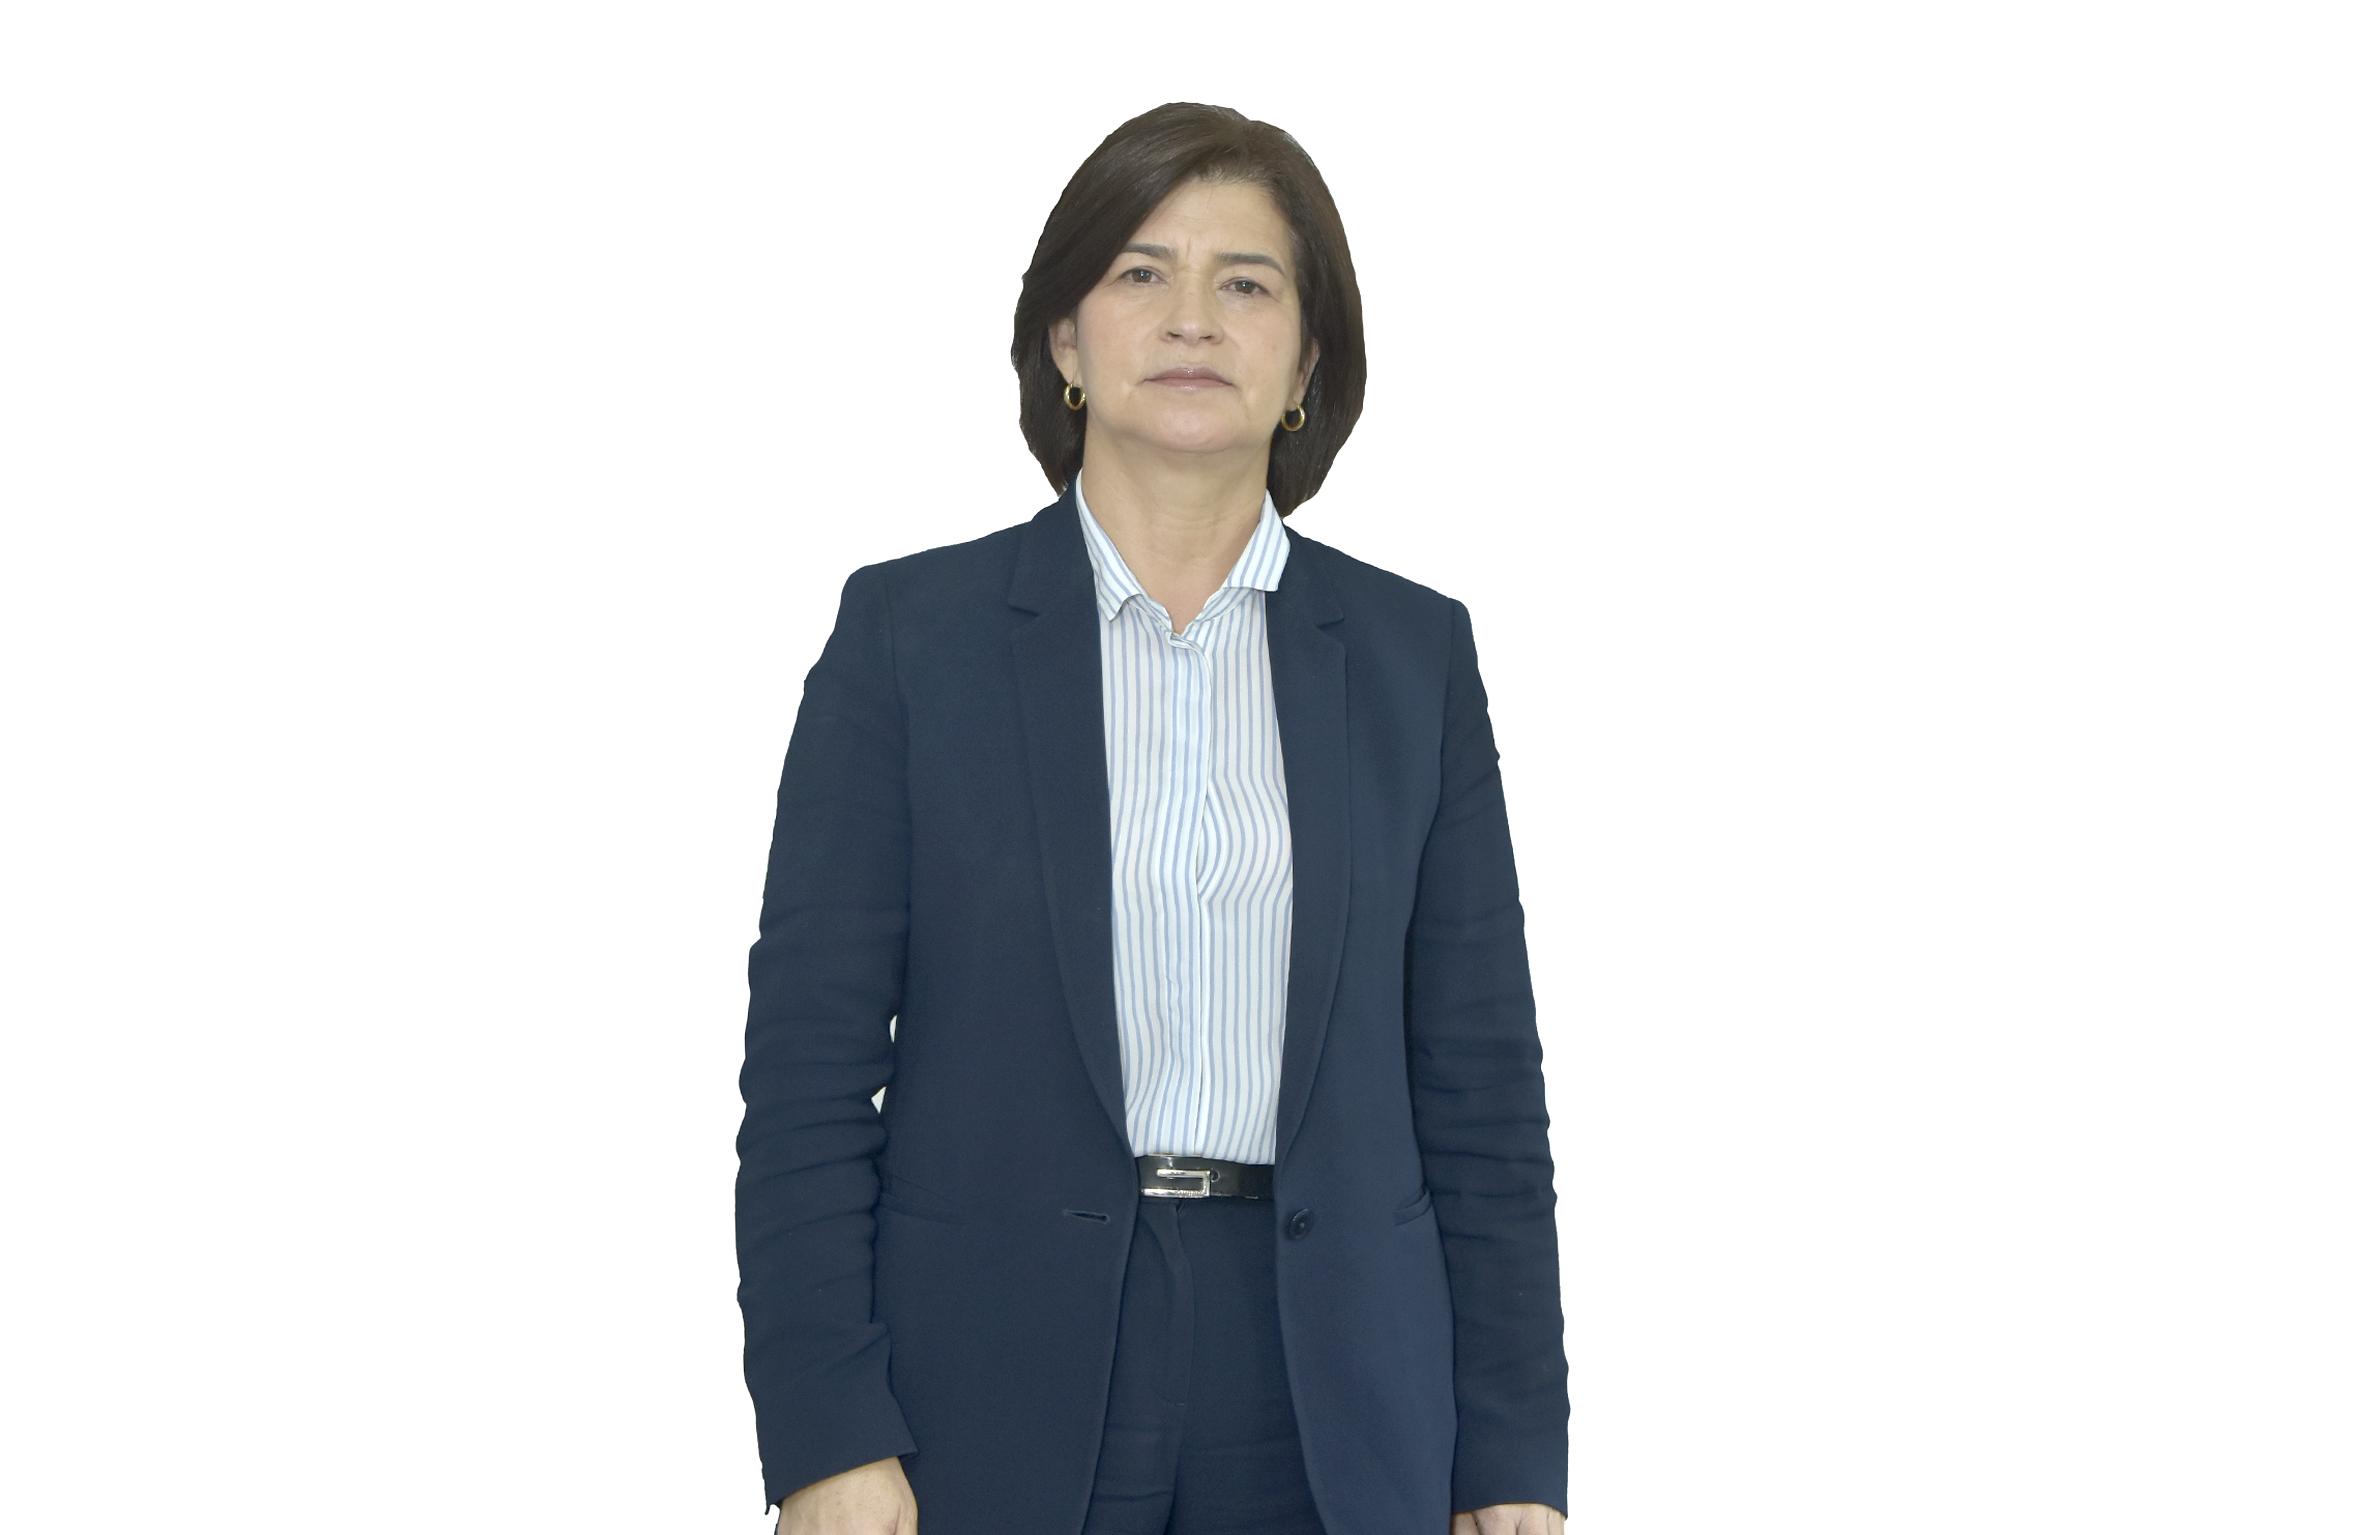 Martha Yolanda Ciro Flórez